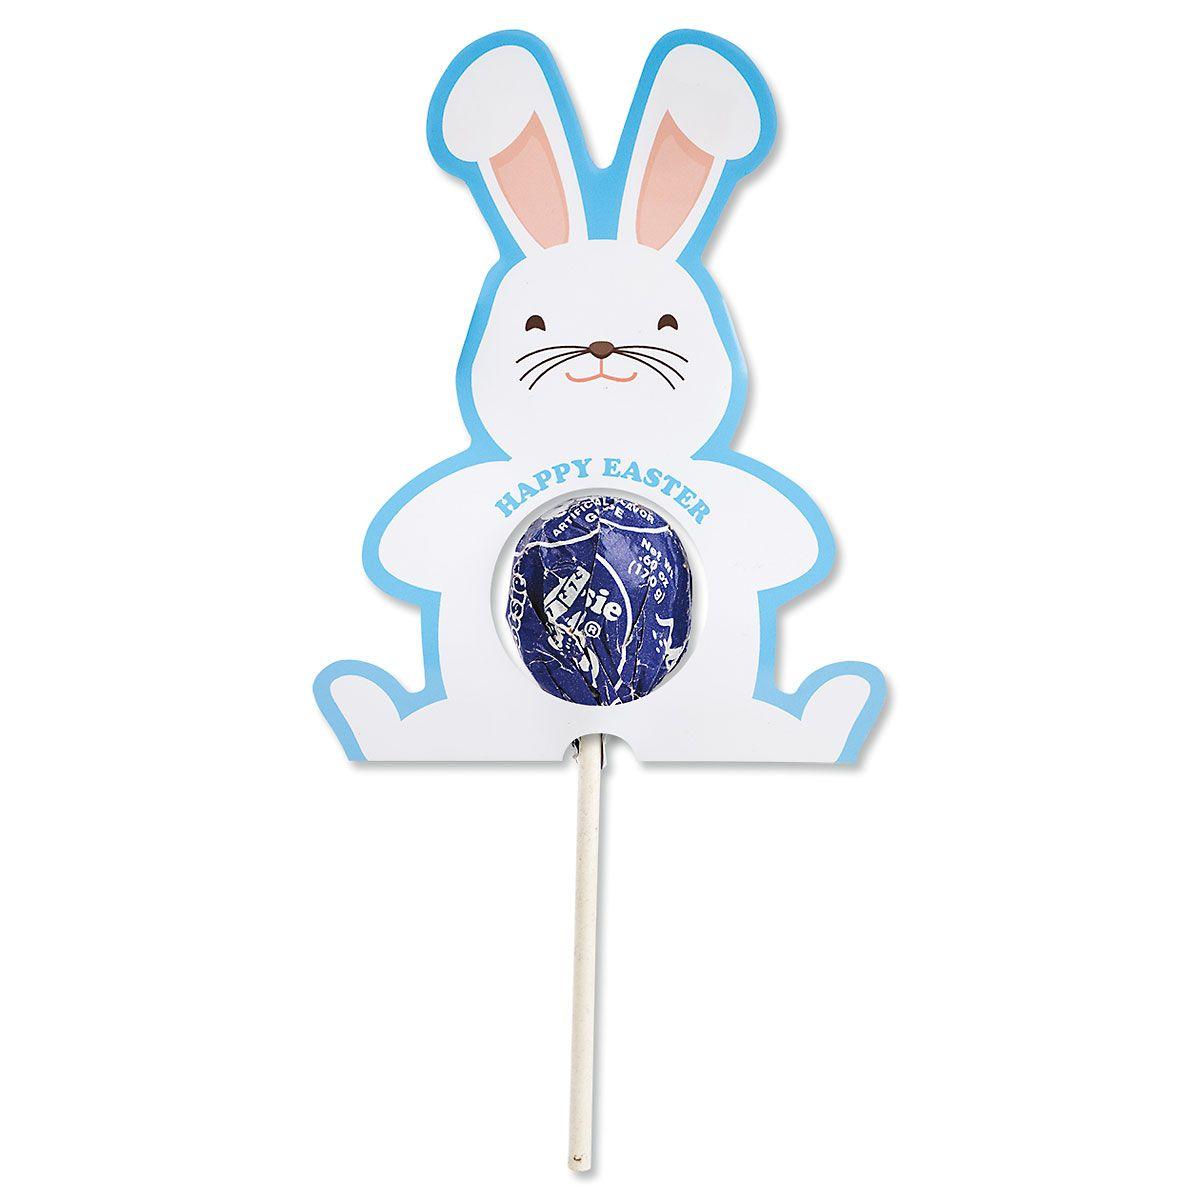 Easter Bunny Lollipop Holders